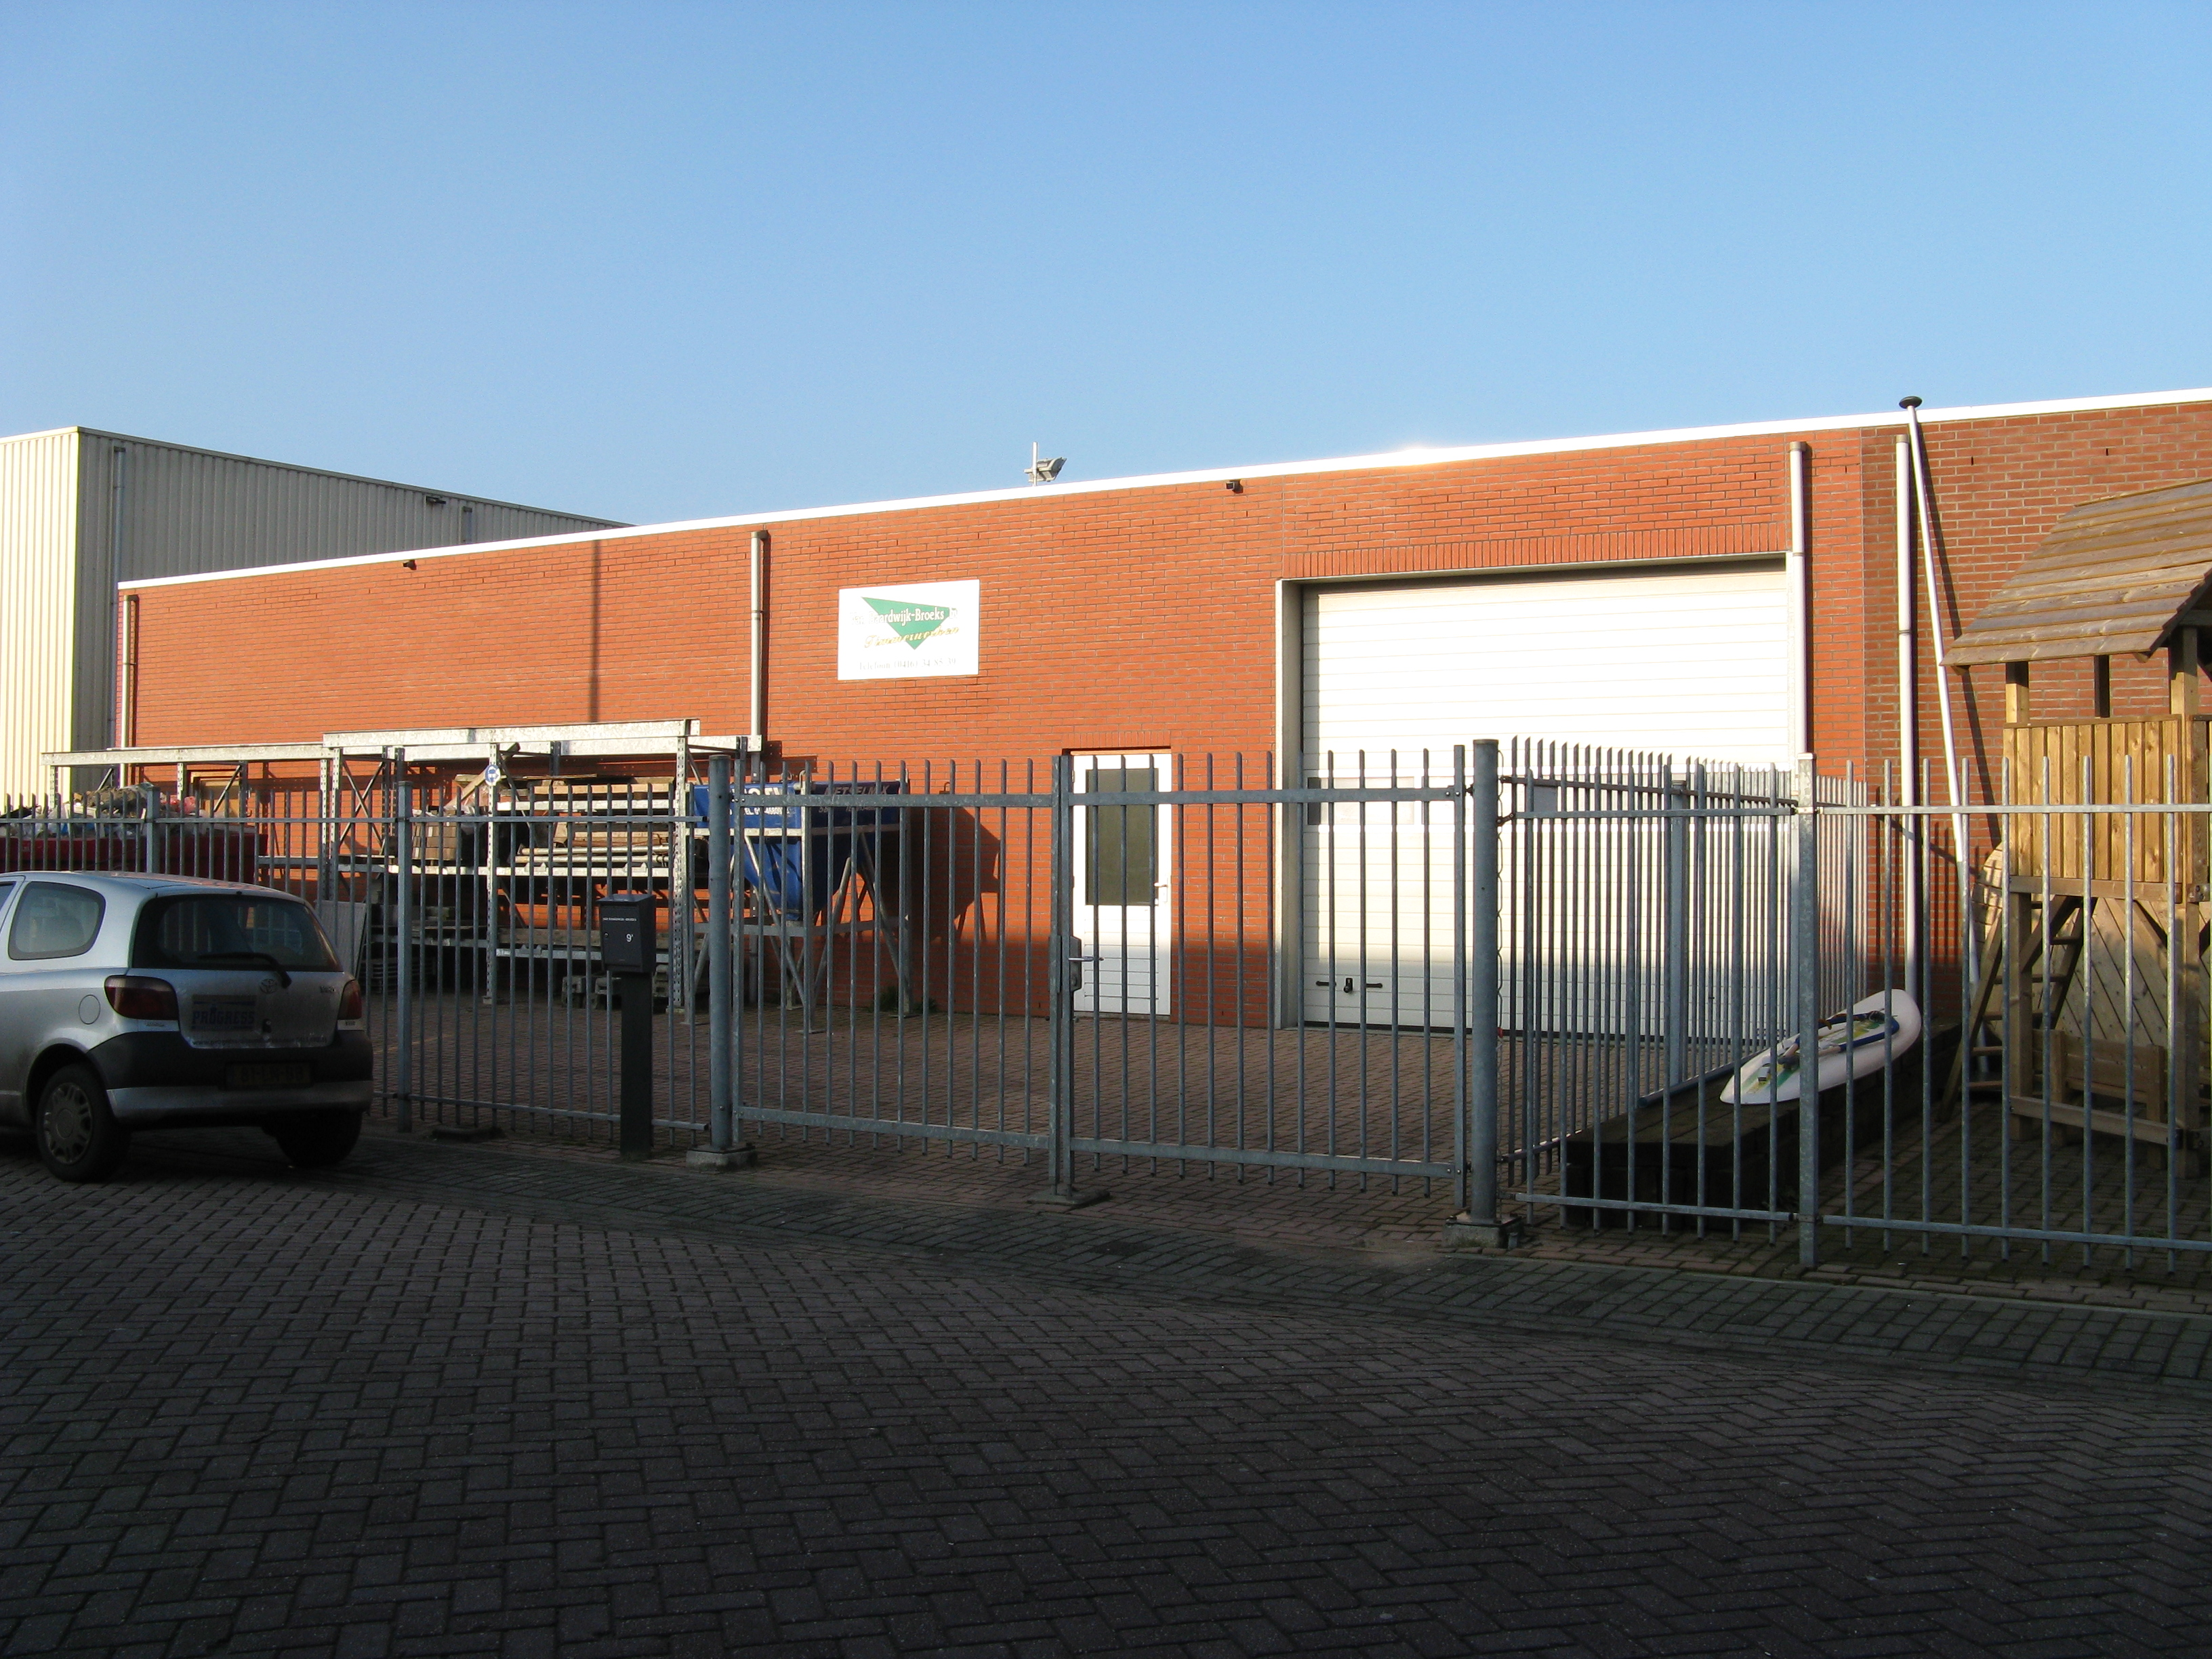 Bedrijfsruimte Sprang-Capelle Tinus van der Sydestraat 9a